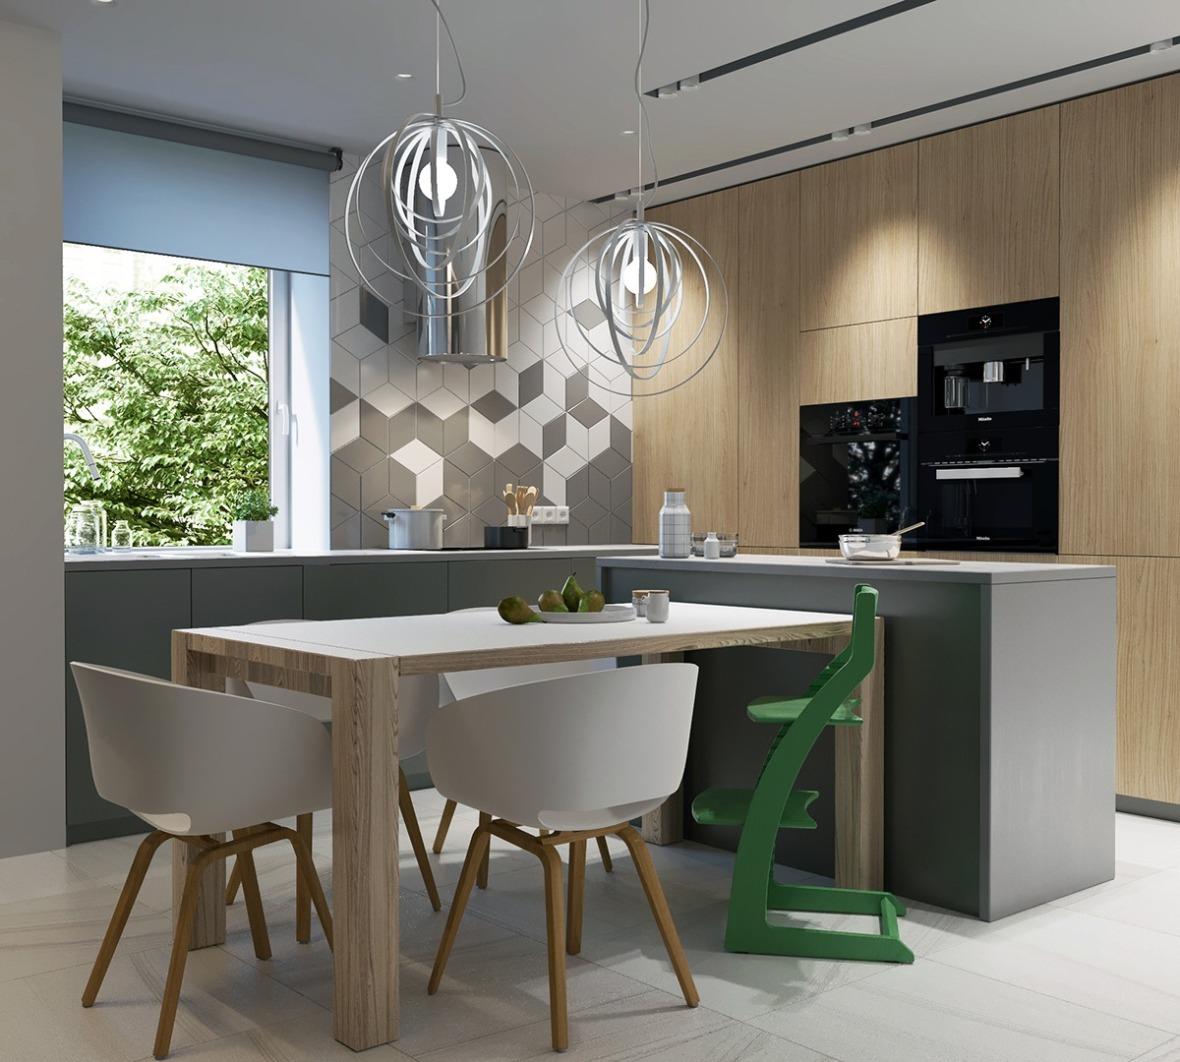 2modern-kitchen-wood-table-green-highchair-black-appliances